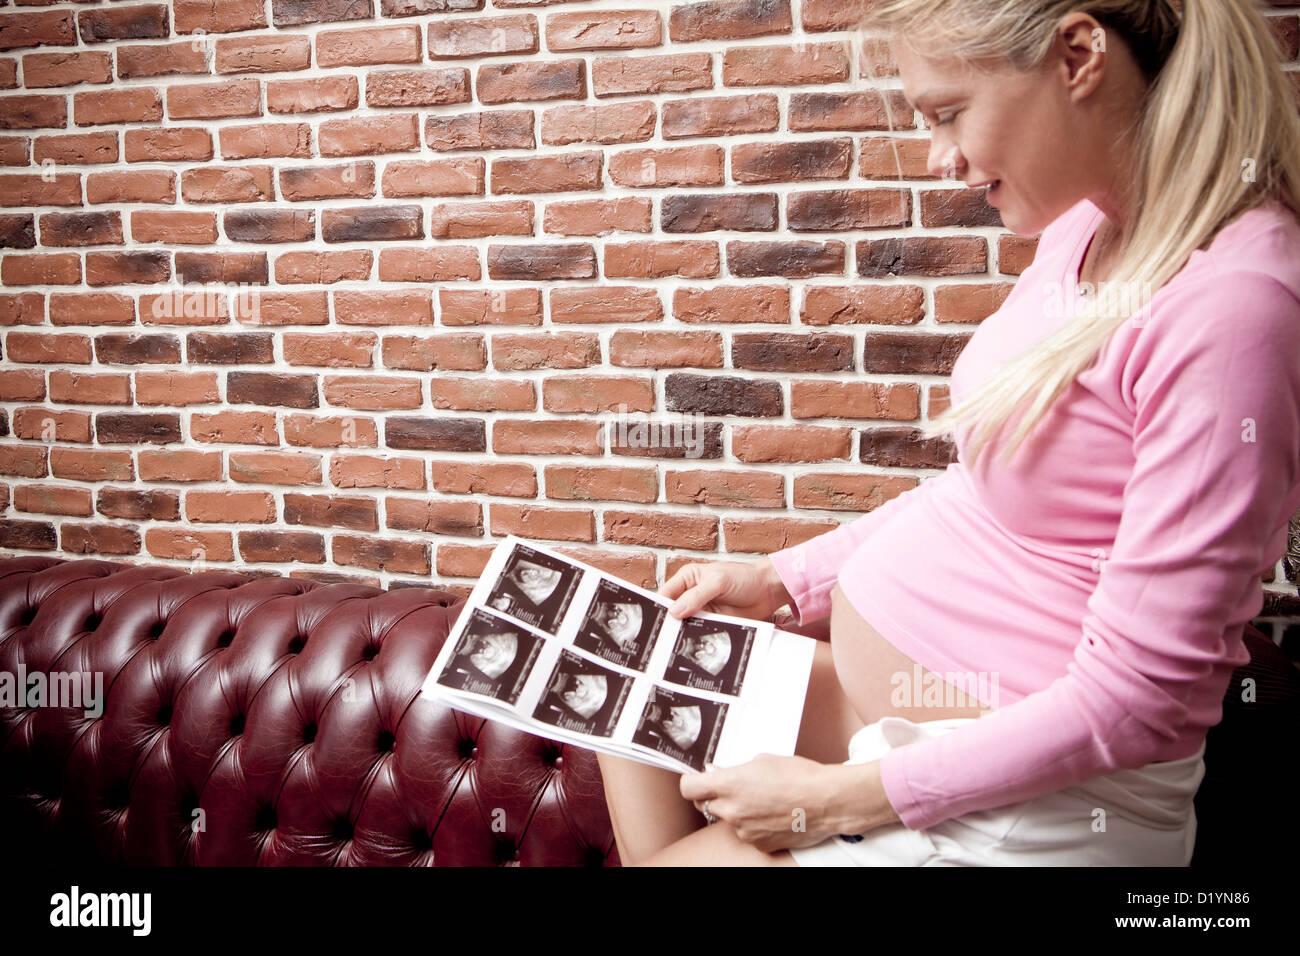 Schwangere Frau mit morphologischen scan Stockbild